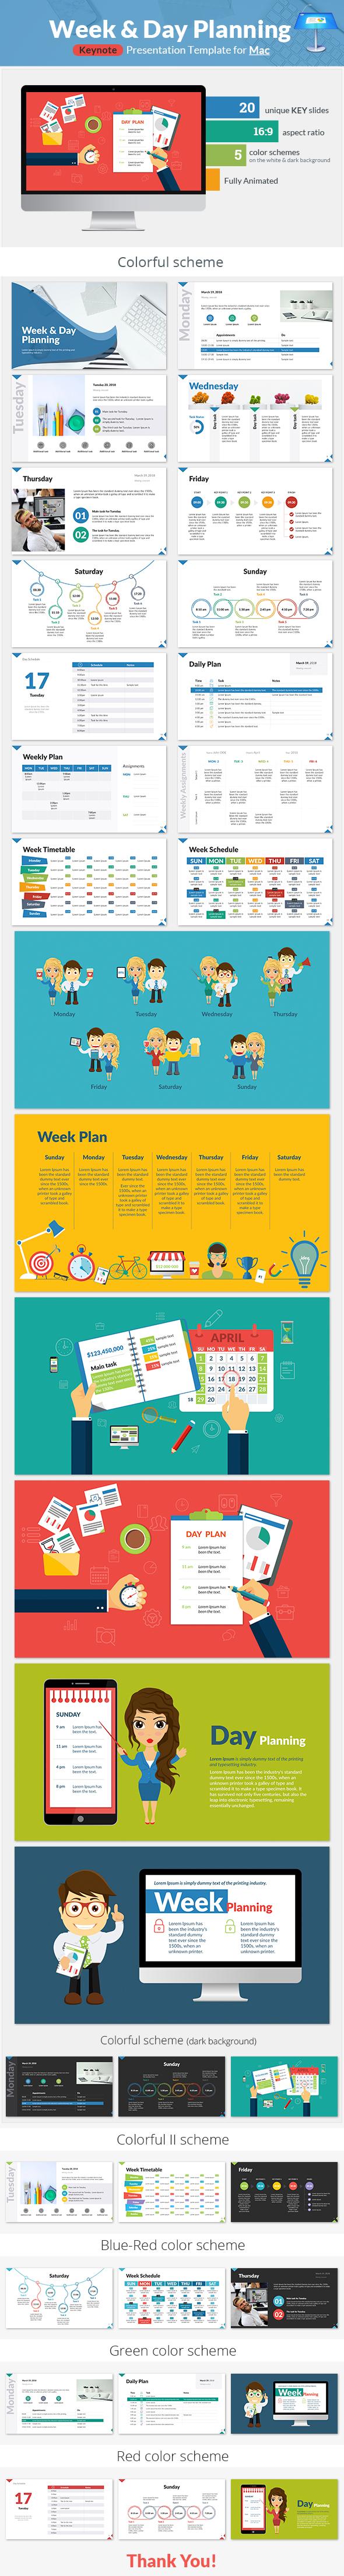 Week and Day Planning Keynote Presentation Template - Keynote Templates Presentation Templates